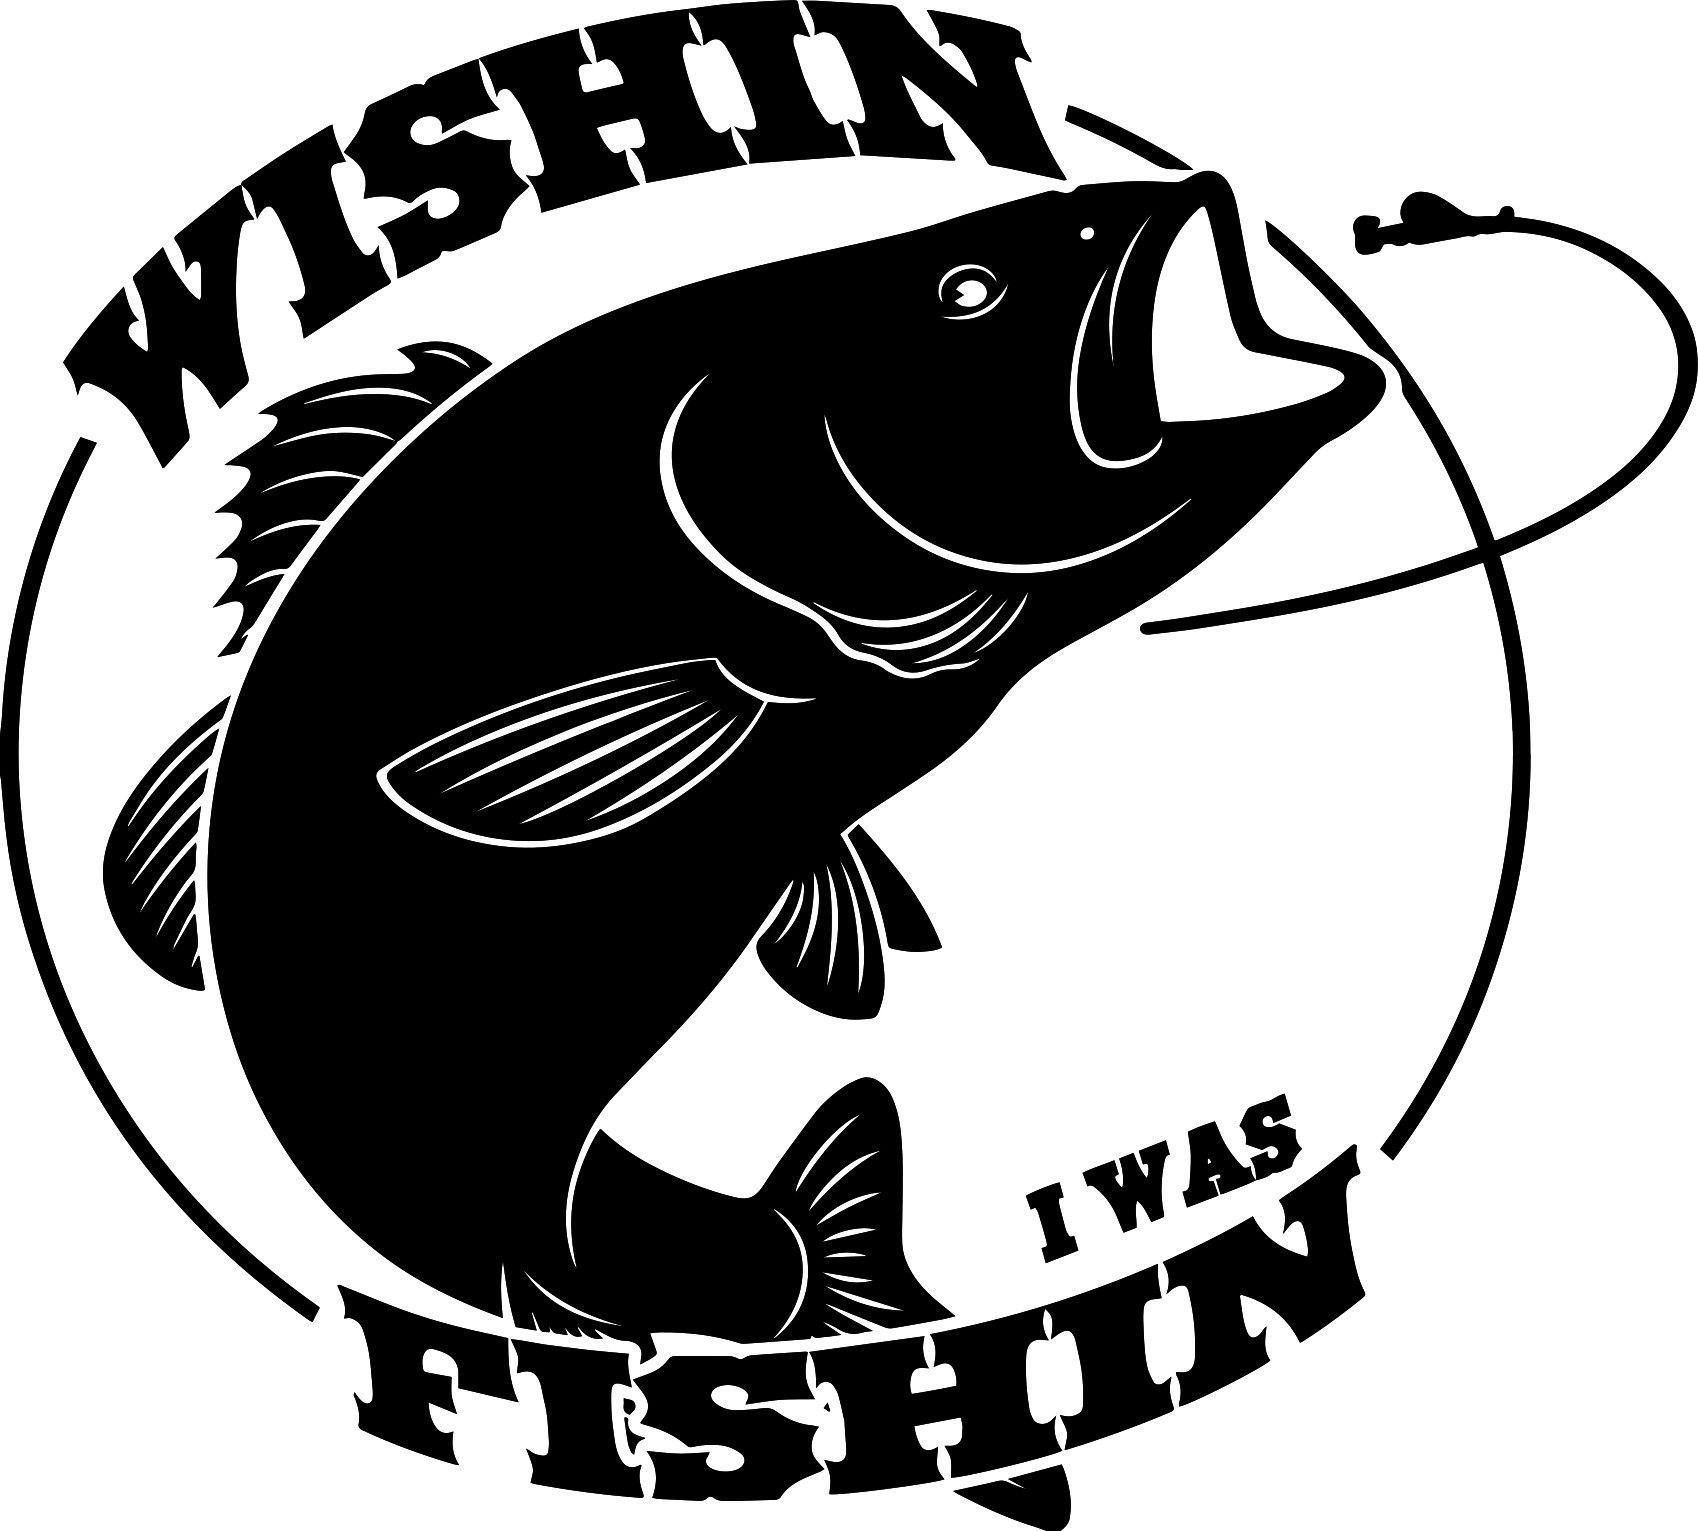 Download Wishin I Was Fishin 2 Vinyl Sticker Fishing Decals Fishing Svg Vinyl Sticker